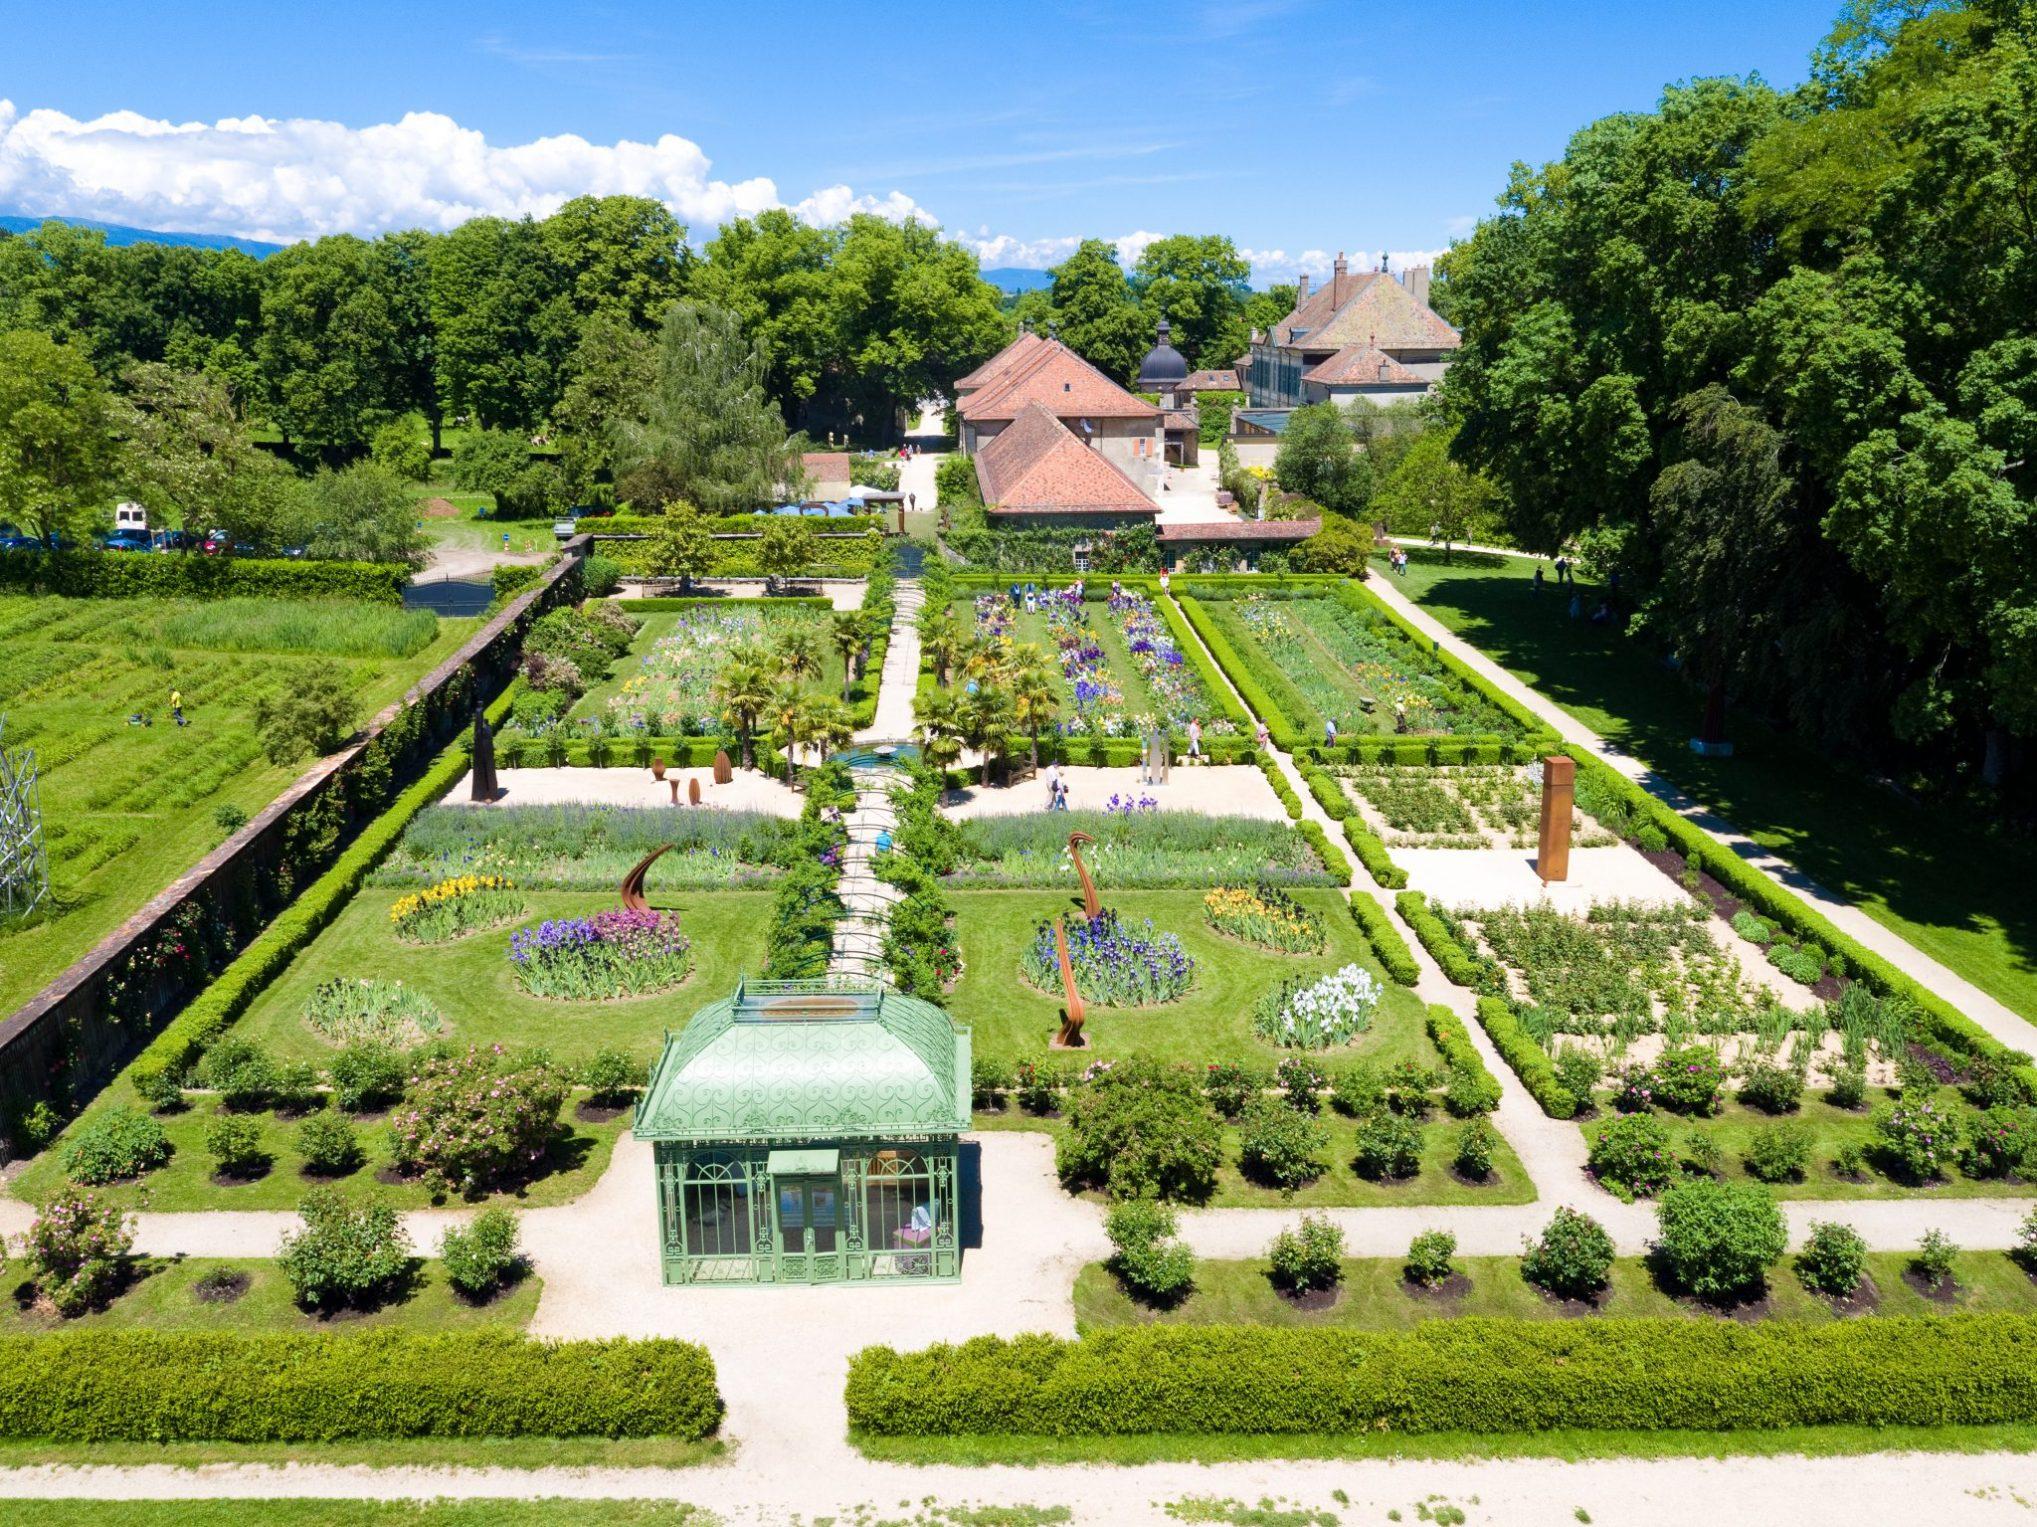 Vue aérienne du jardin de Doreen